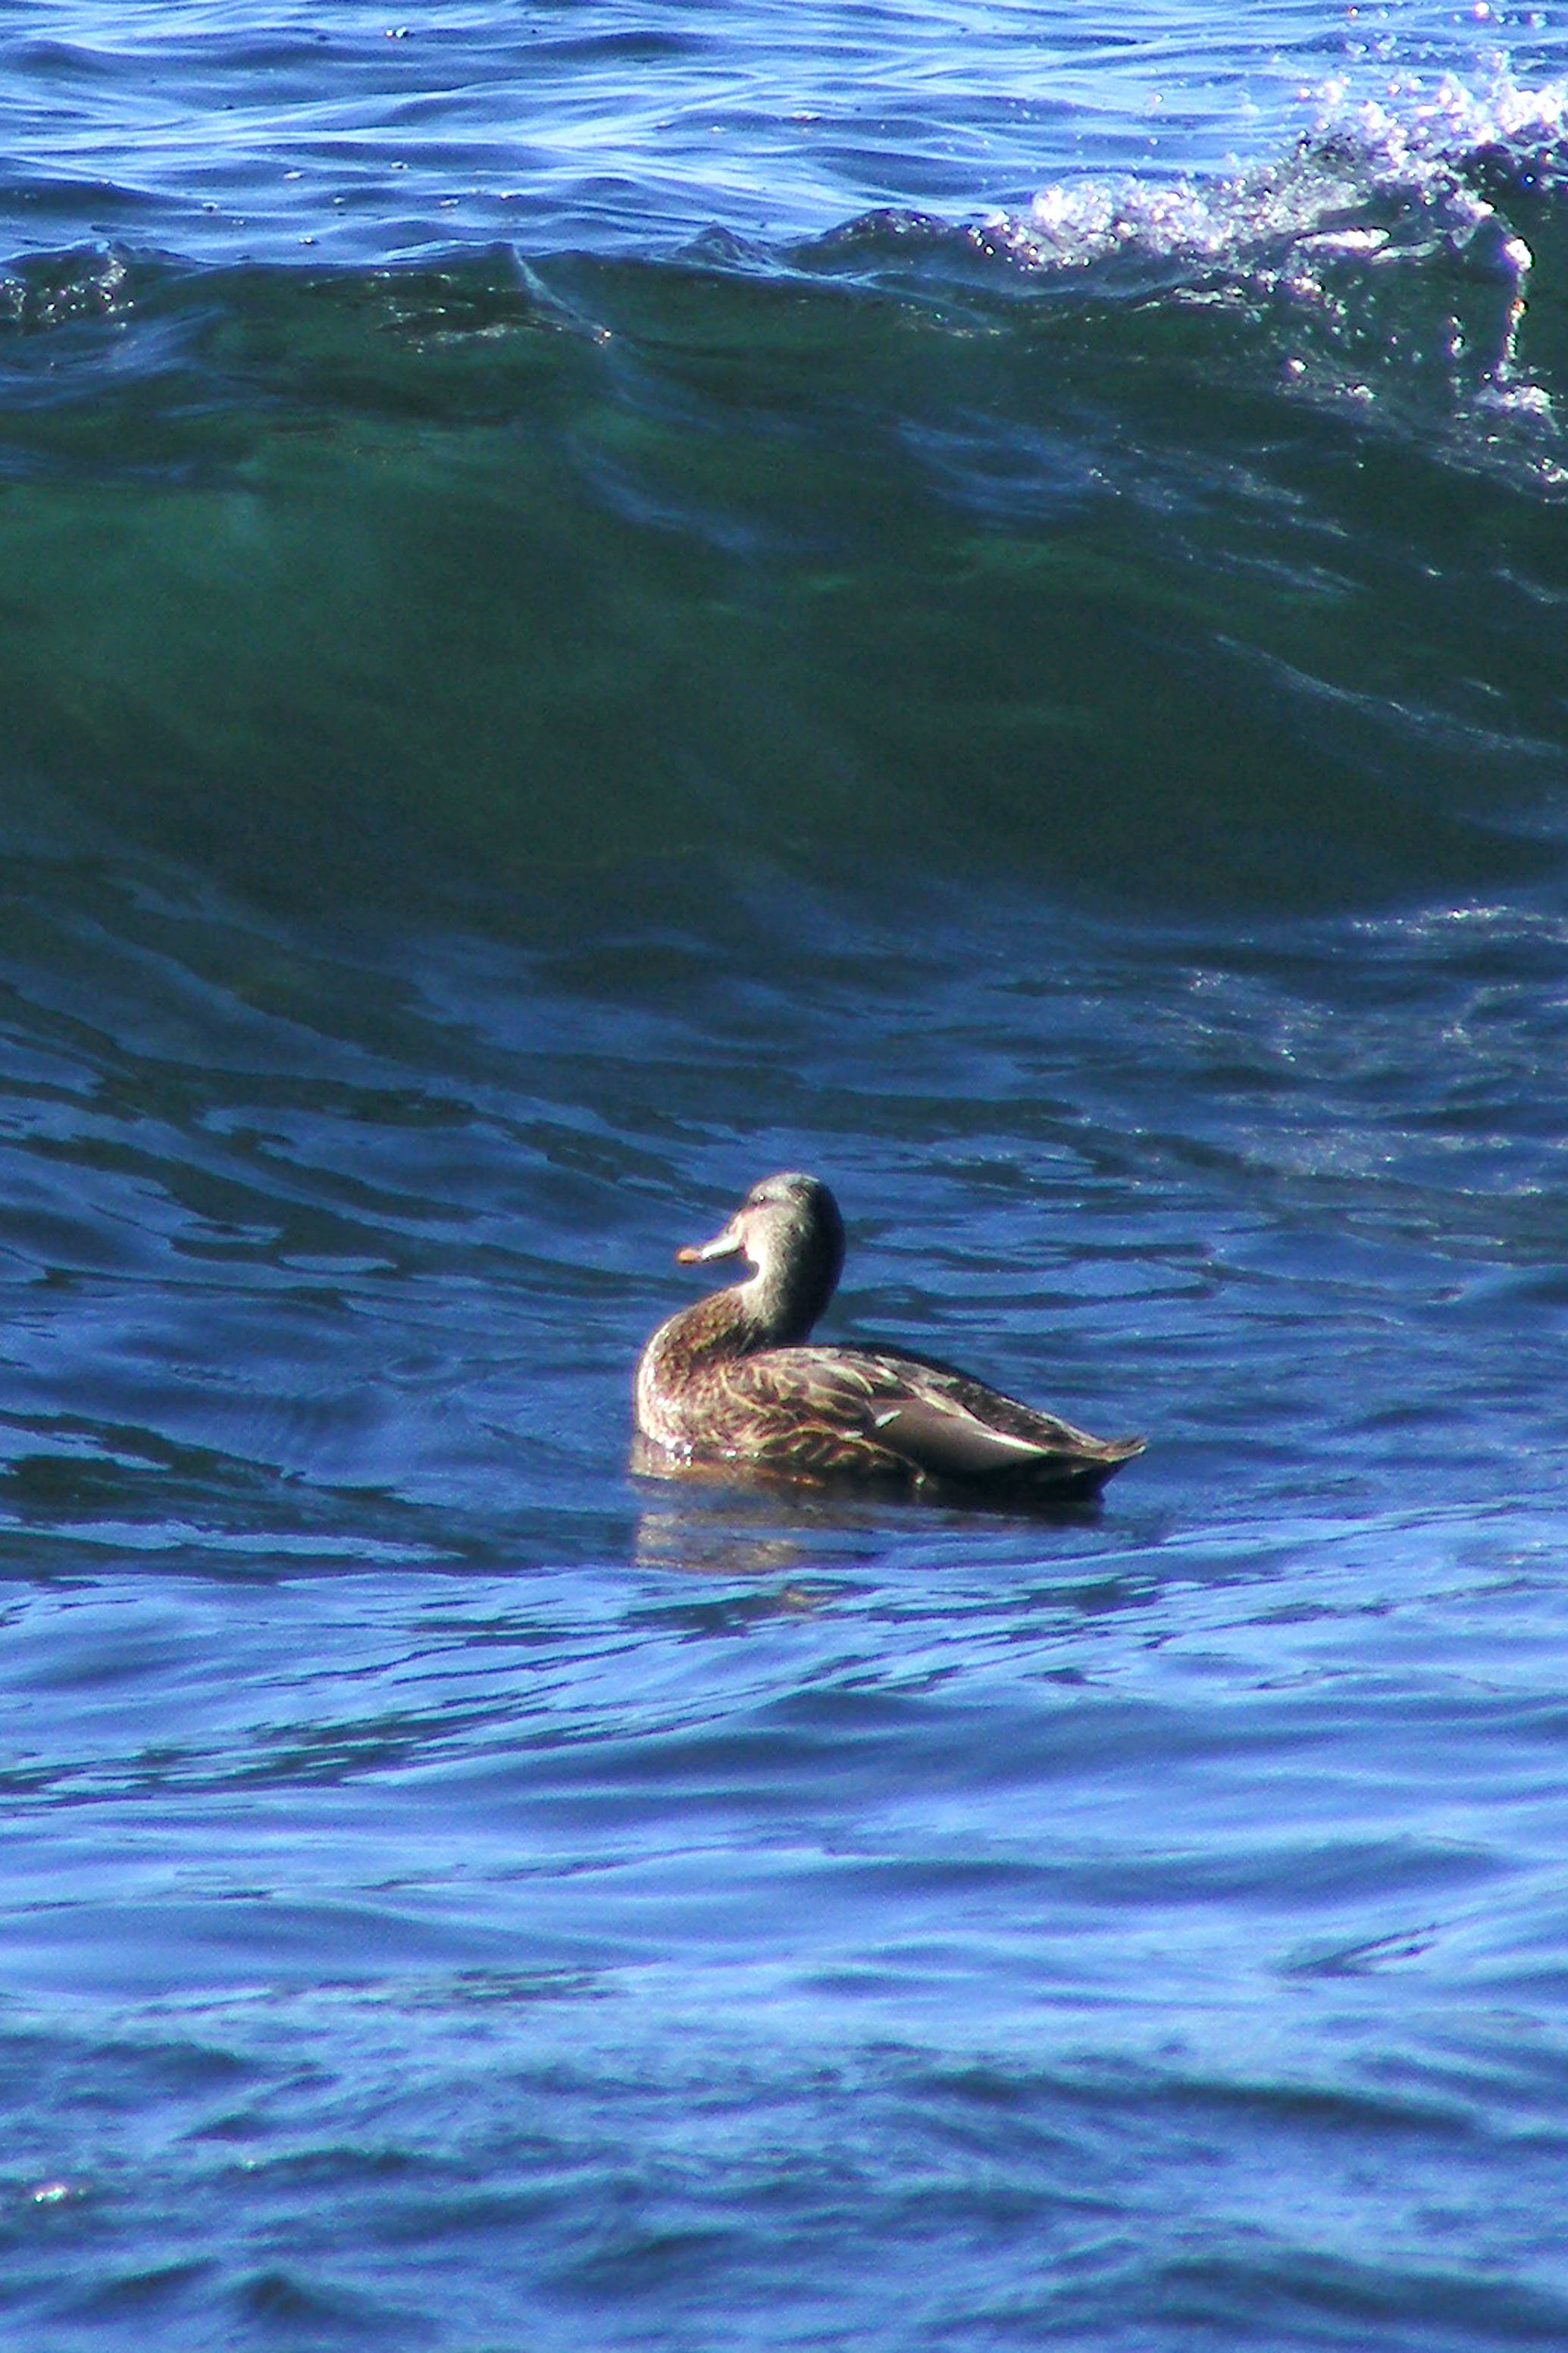 Duckwave